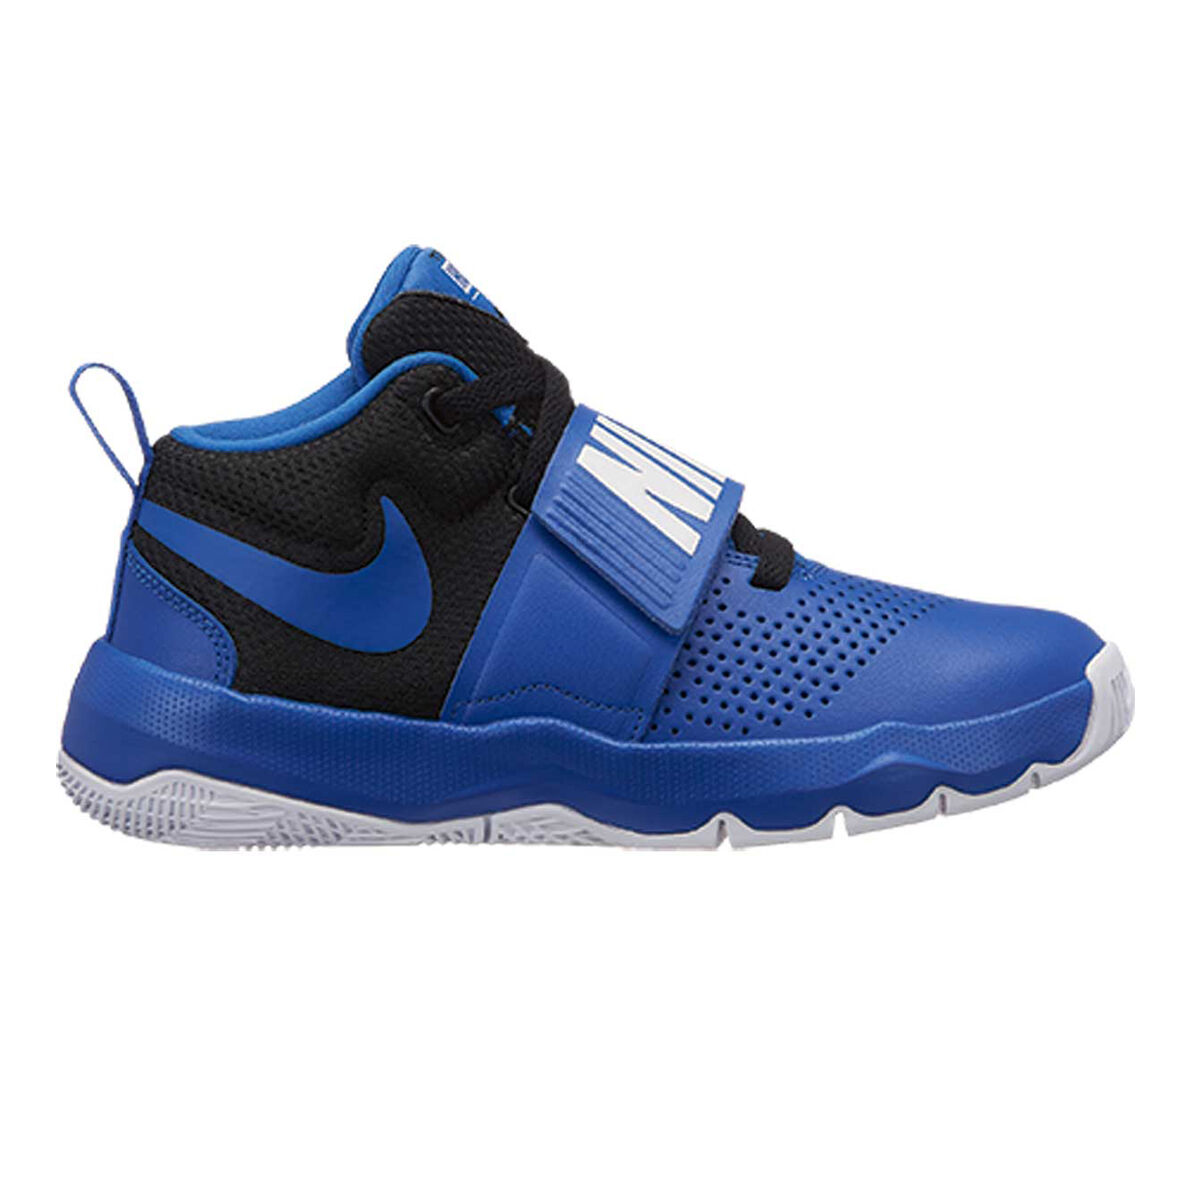 3647b91acf2710 australia nike team hustle d 8 kids basketball shoes blue black us 4 852a4  e4b24